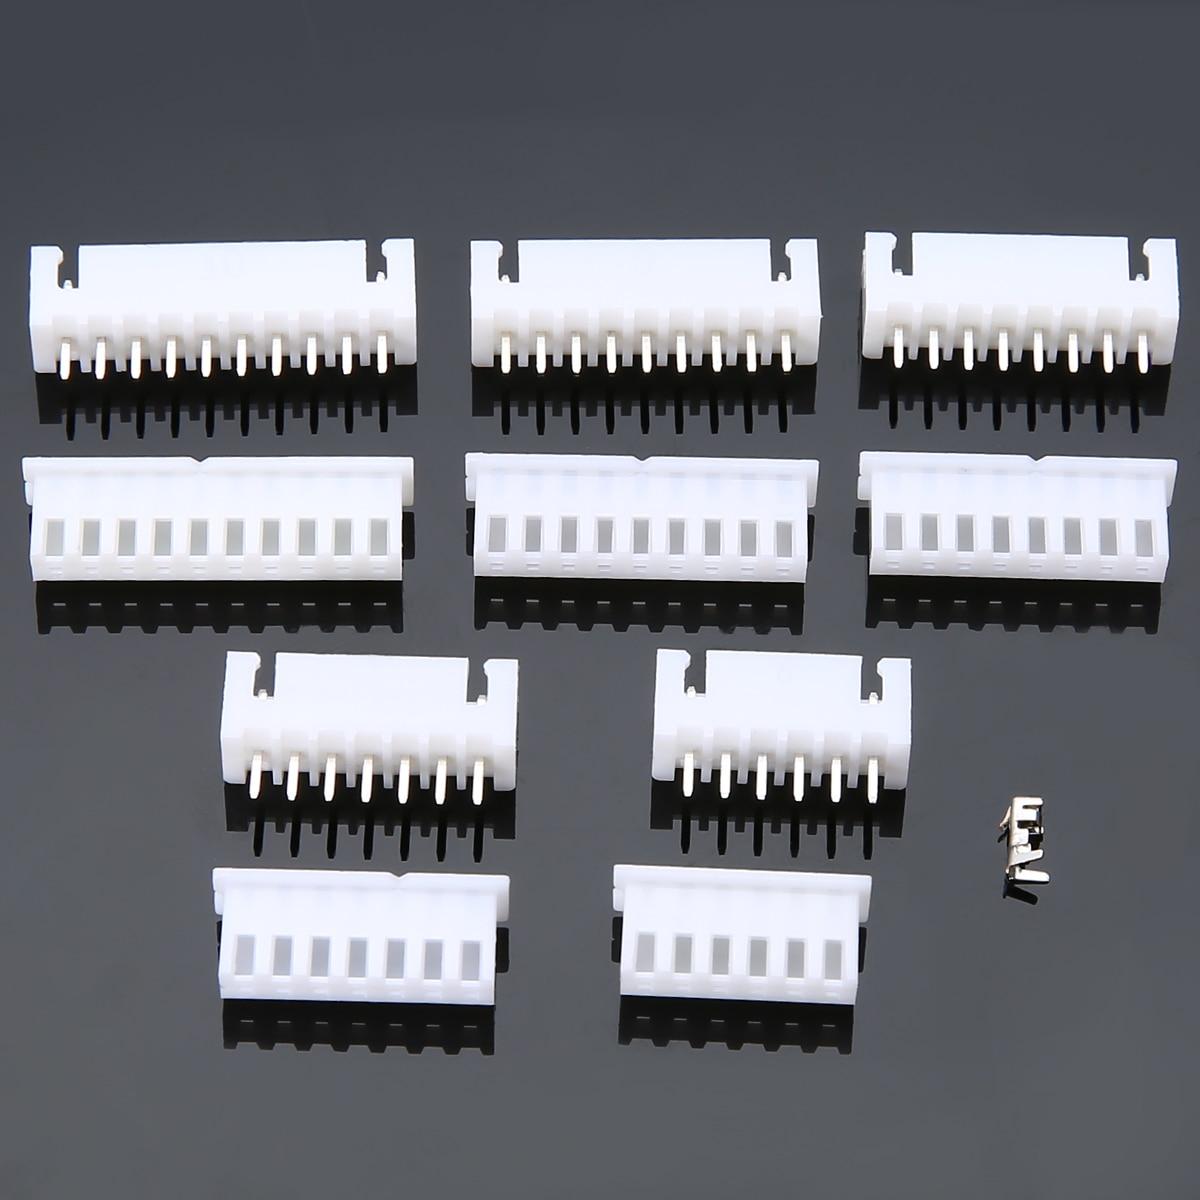 25 Set JST-XH 2.54mm Pitch Terminal Housing PCB Header Wire Cable Connectors 6P/7P/8P/9P/10 Pin Way 1804849[pluggable terminal blocks 7 pos 7 62mm pitch through mr li